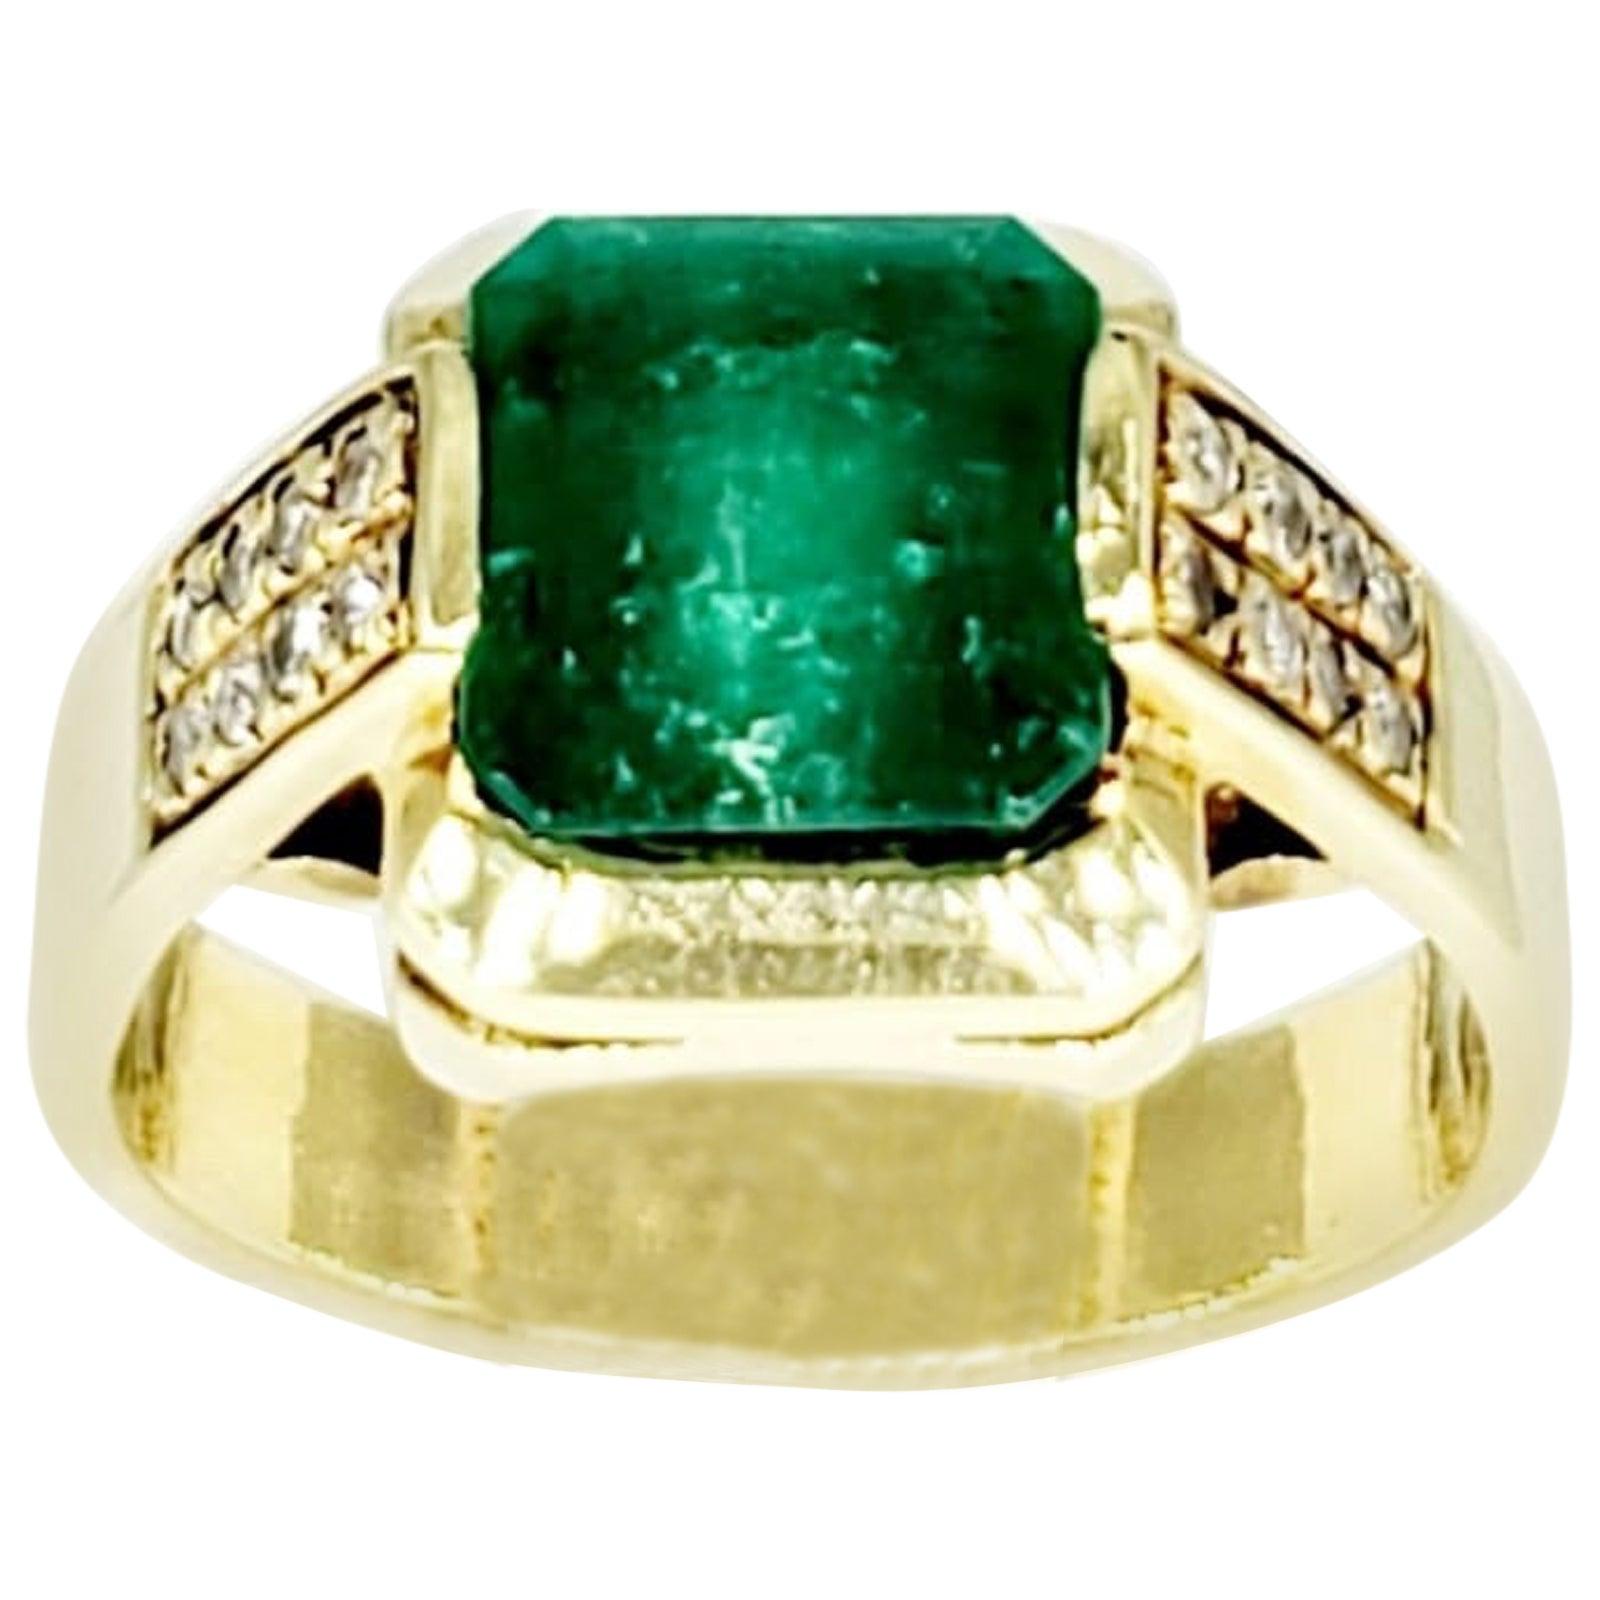 Vintage 2.50 Carat Colombian Emerald and Diamonds 18 Karat Gold Ring